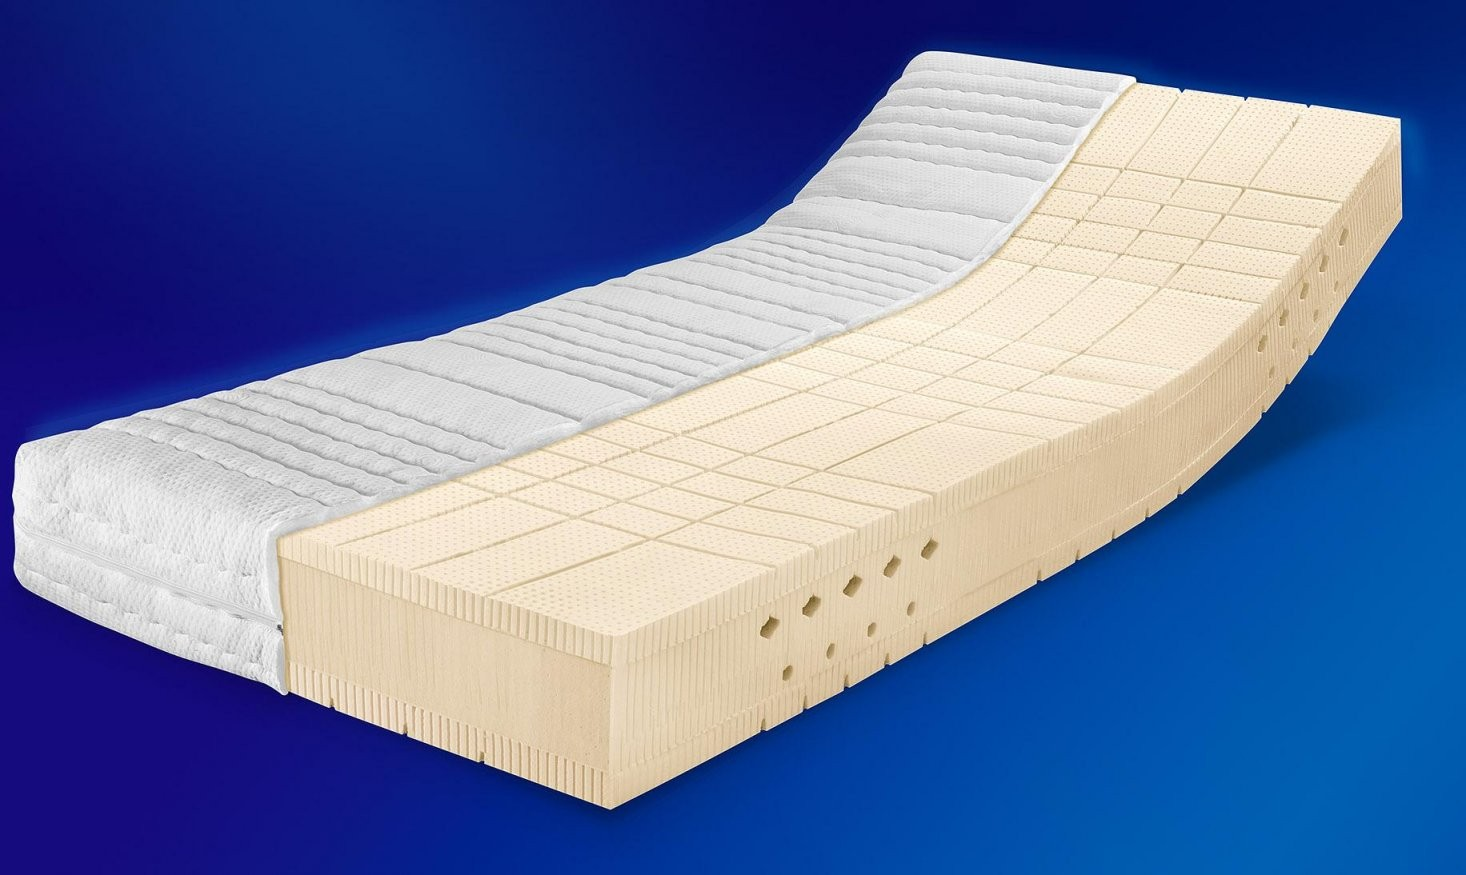 Talalay®  Het Beste Opencellige Talalay Latex Matras von Memory 6 Breckle Visco Topper Bild